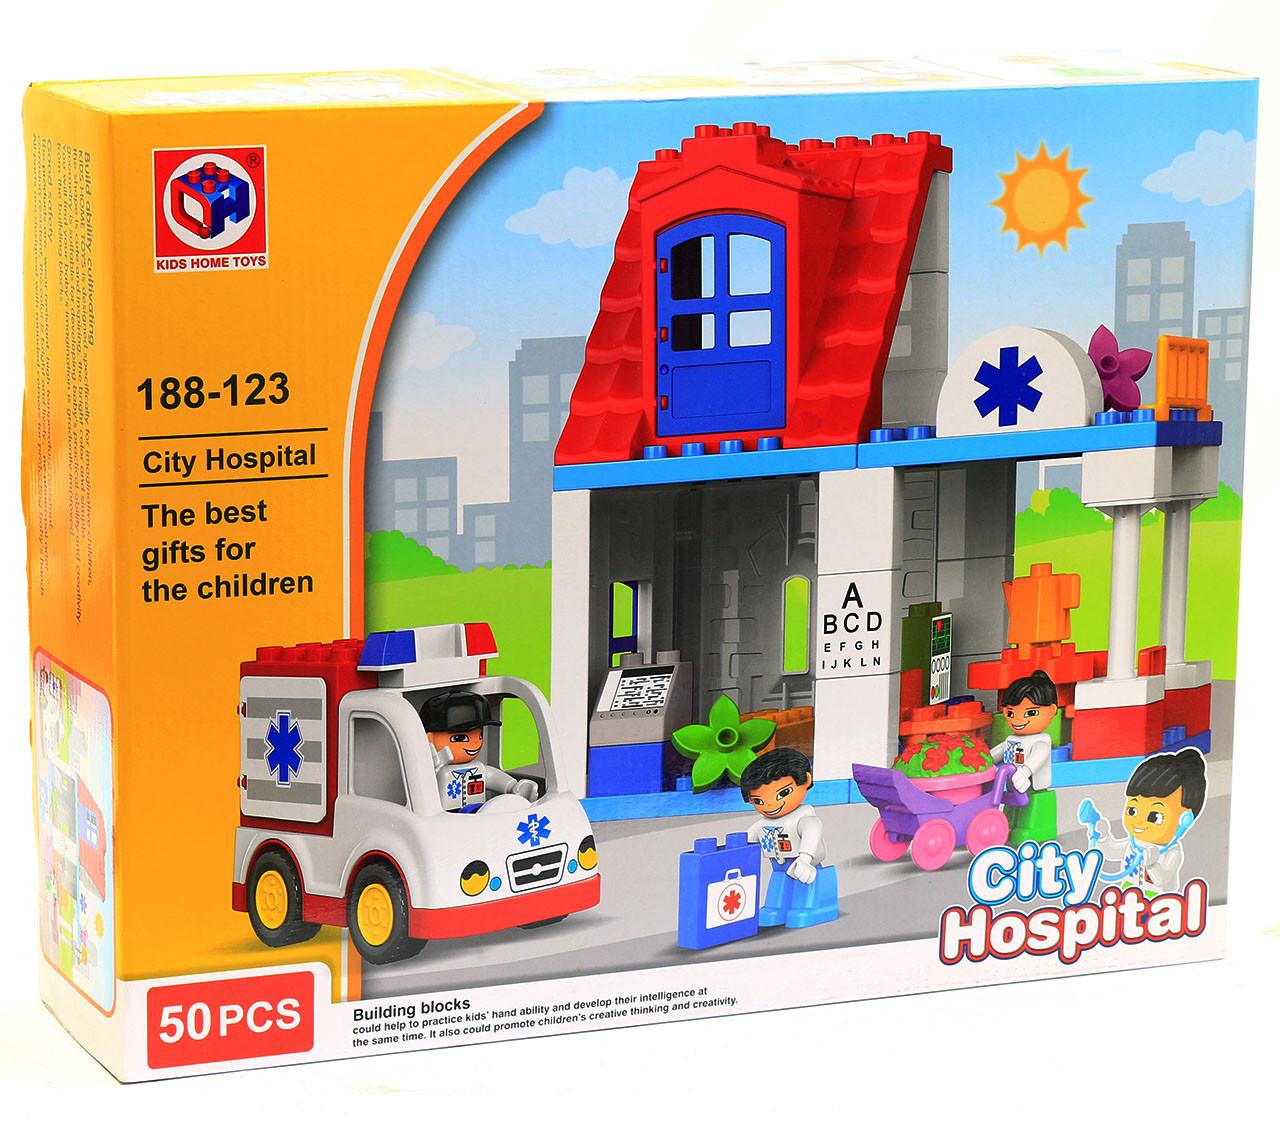 Конструктор Kids Home Toys, Поликлиника, 188-123